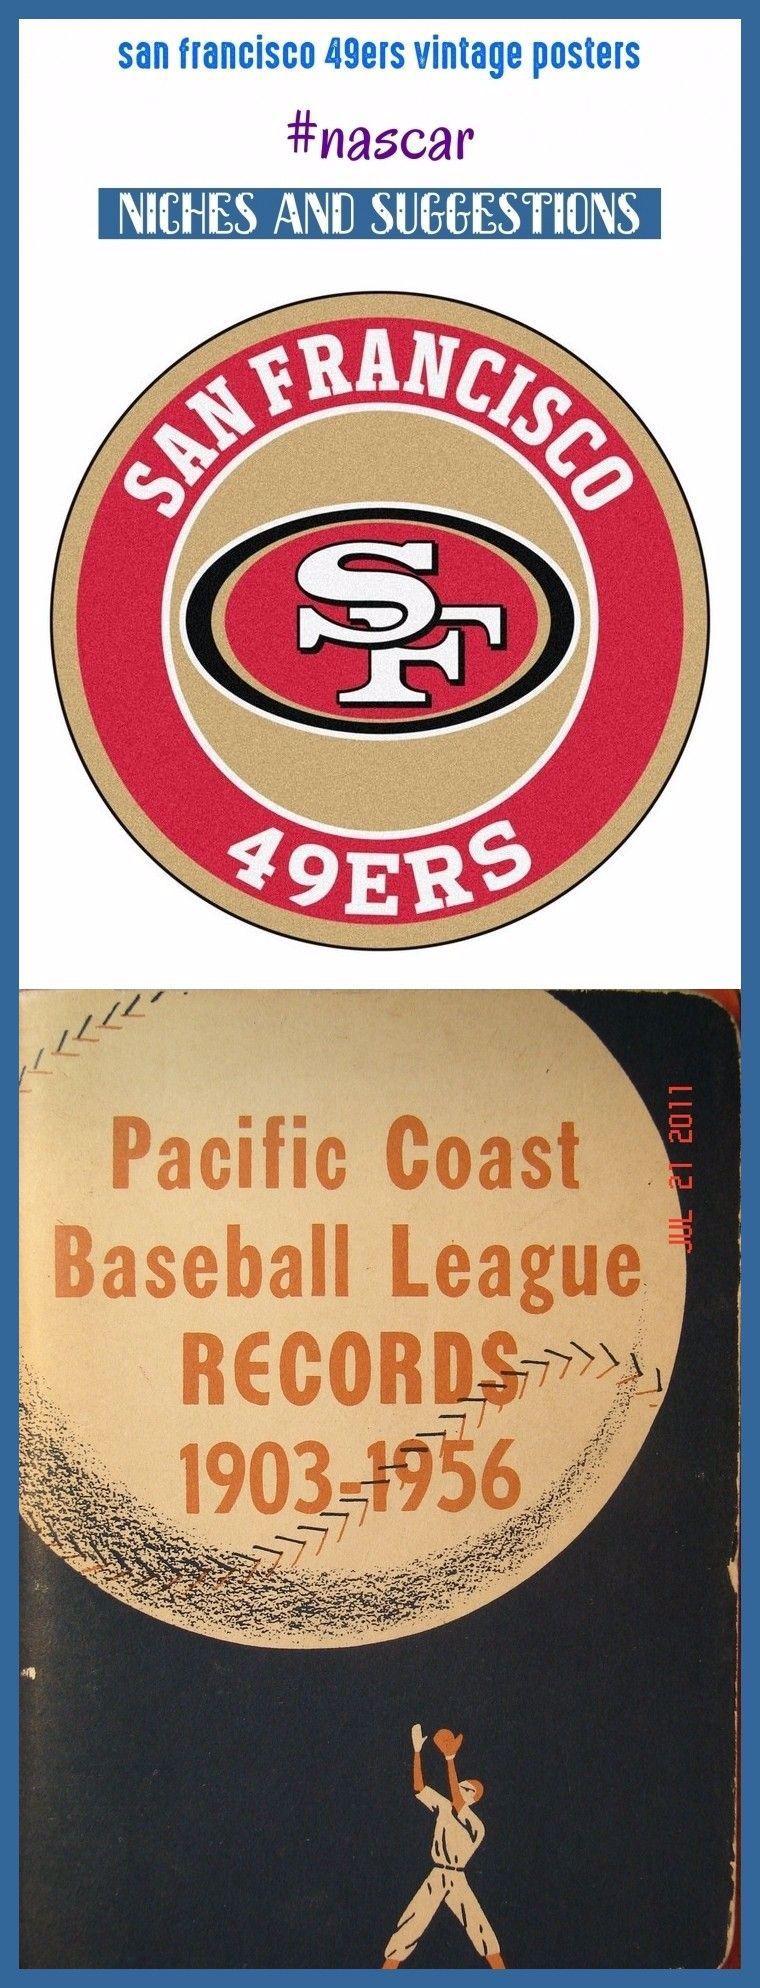 San francisco 49ers vintage posters nascar blog seo